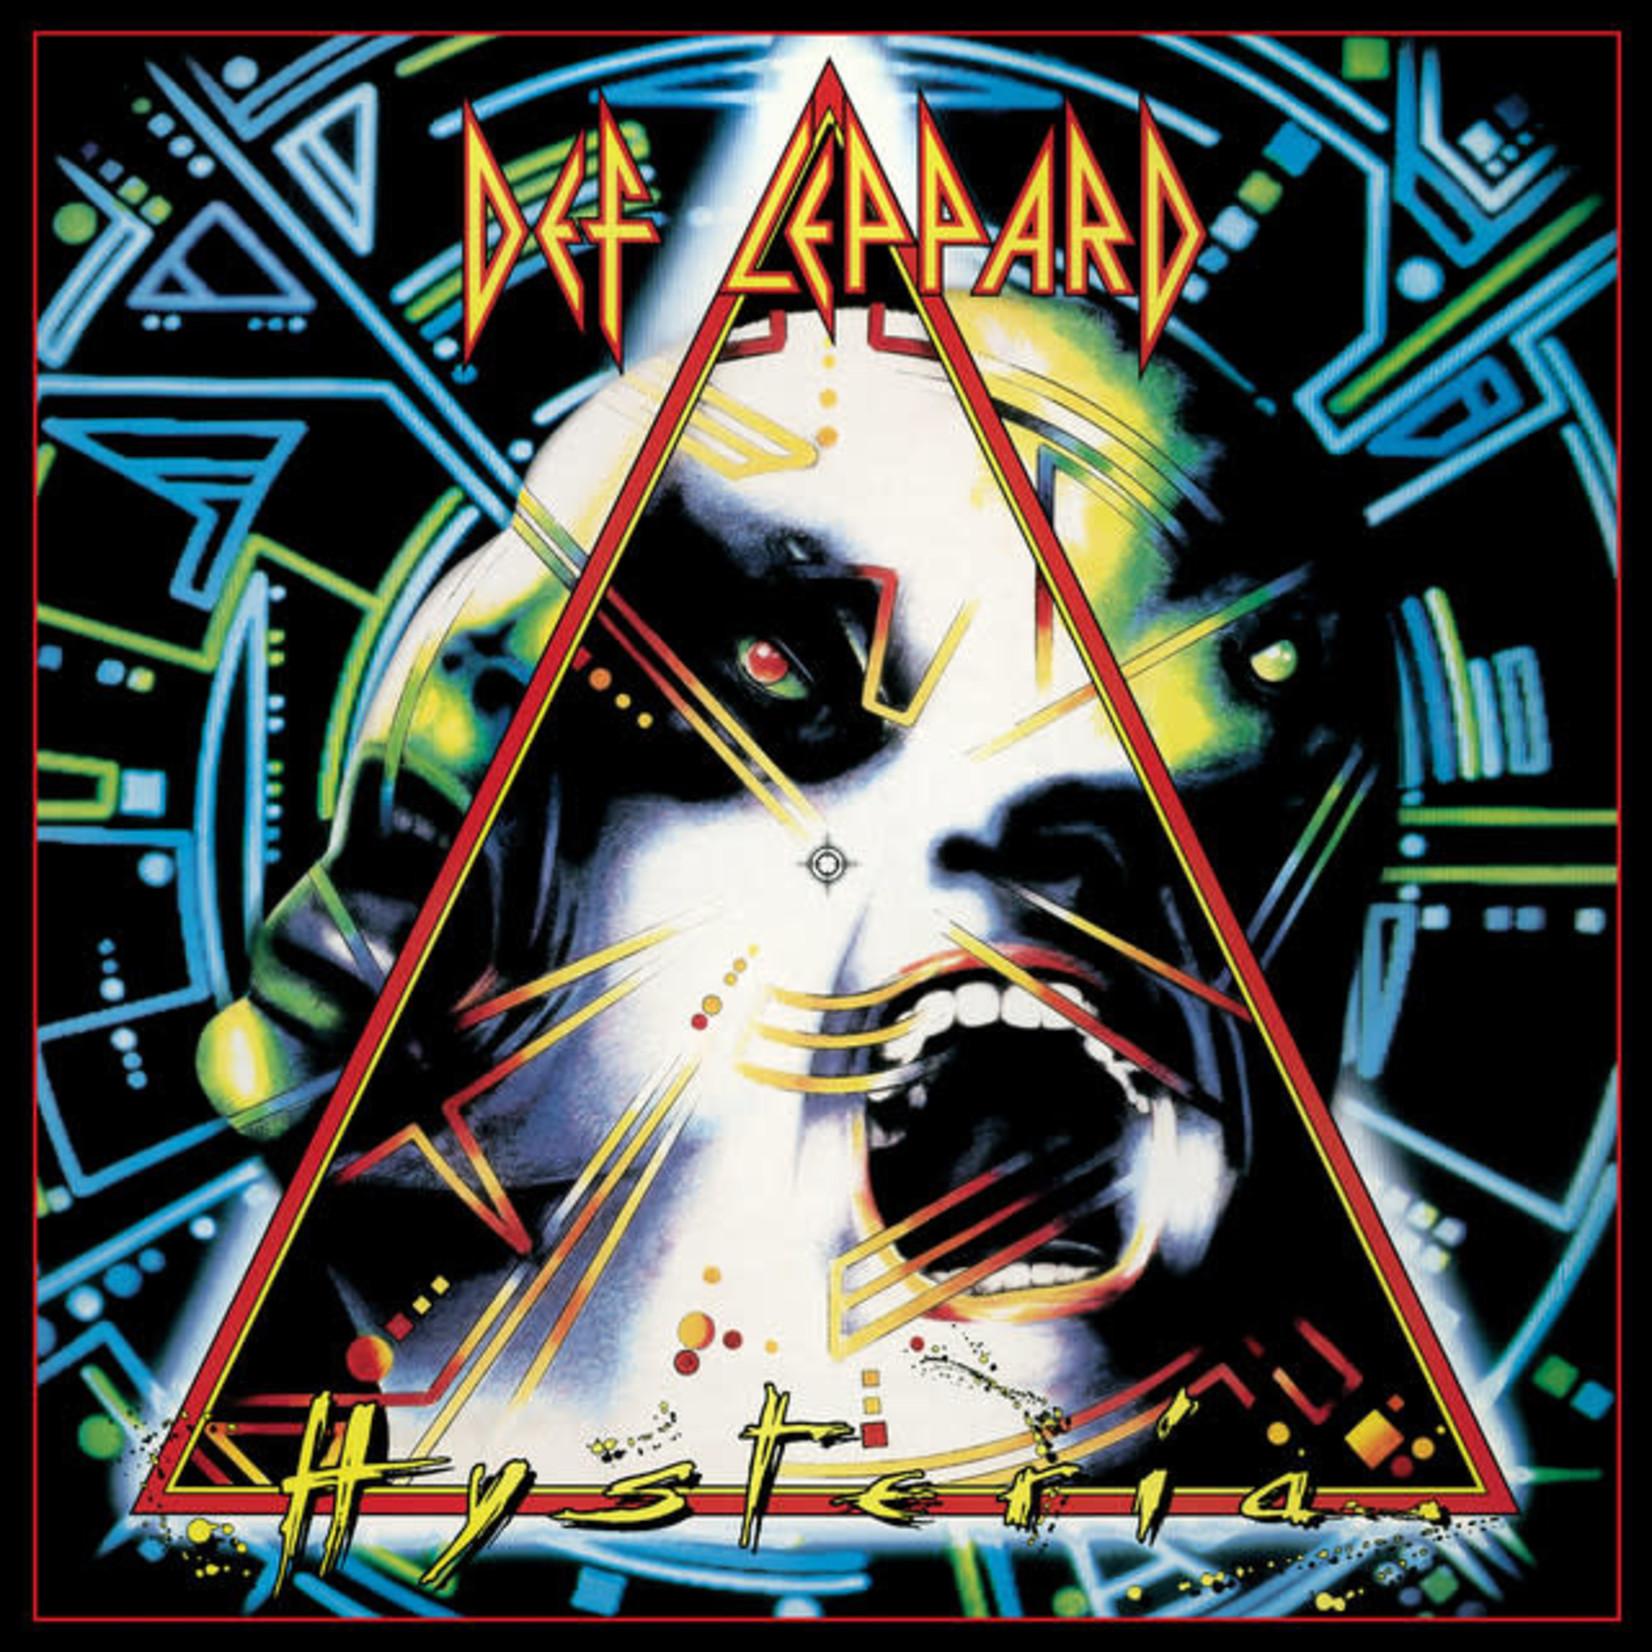 Vinyl Def Leppard - Hysteria